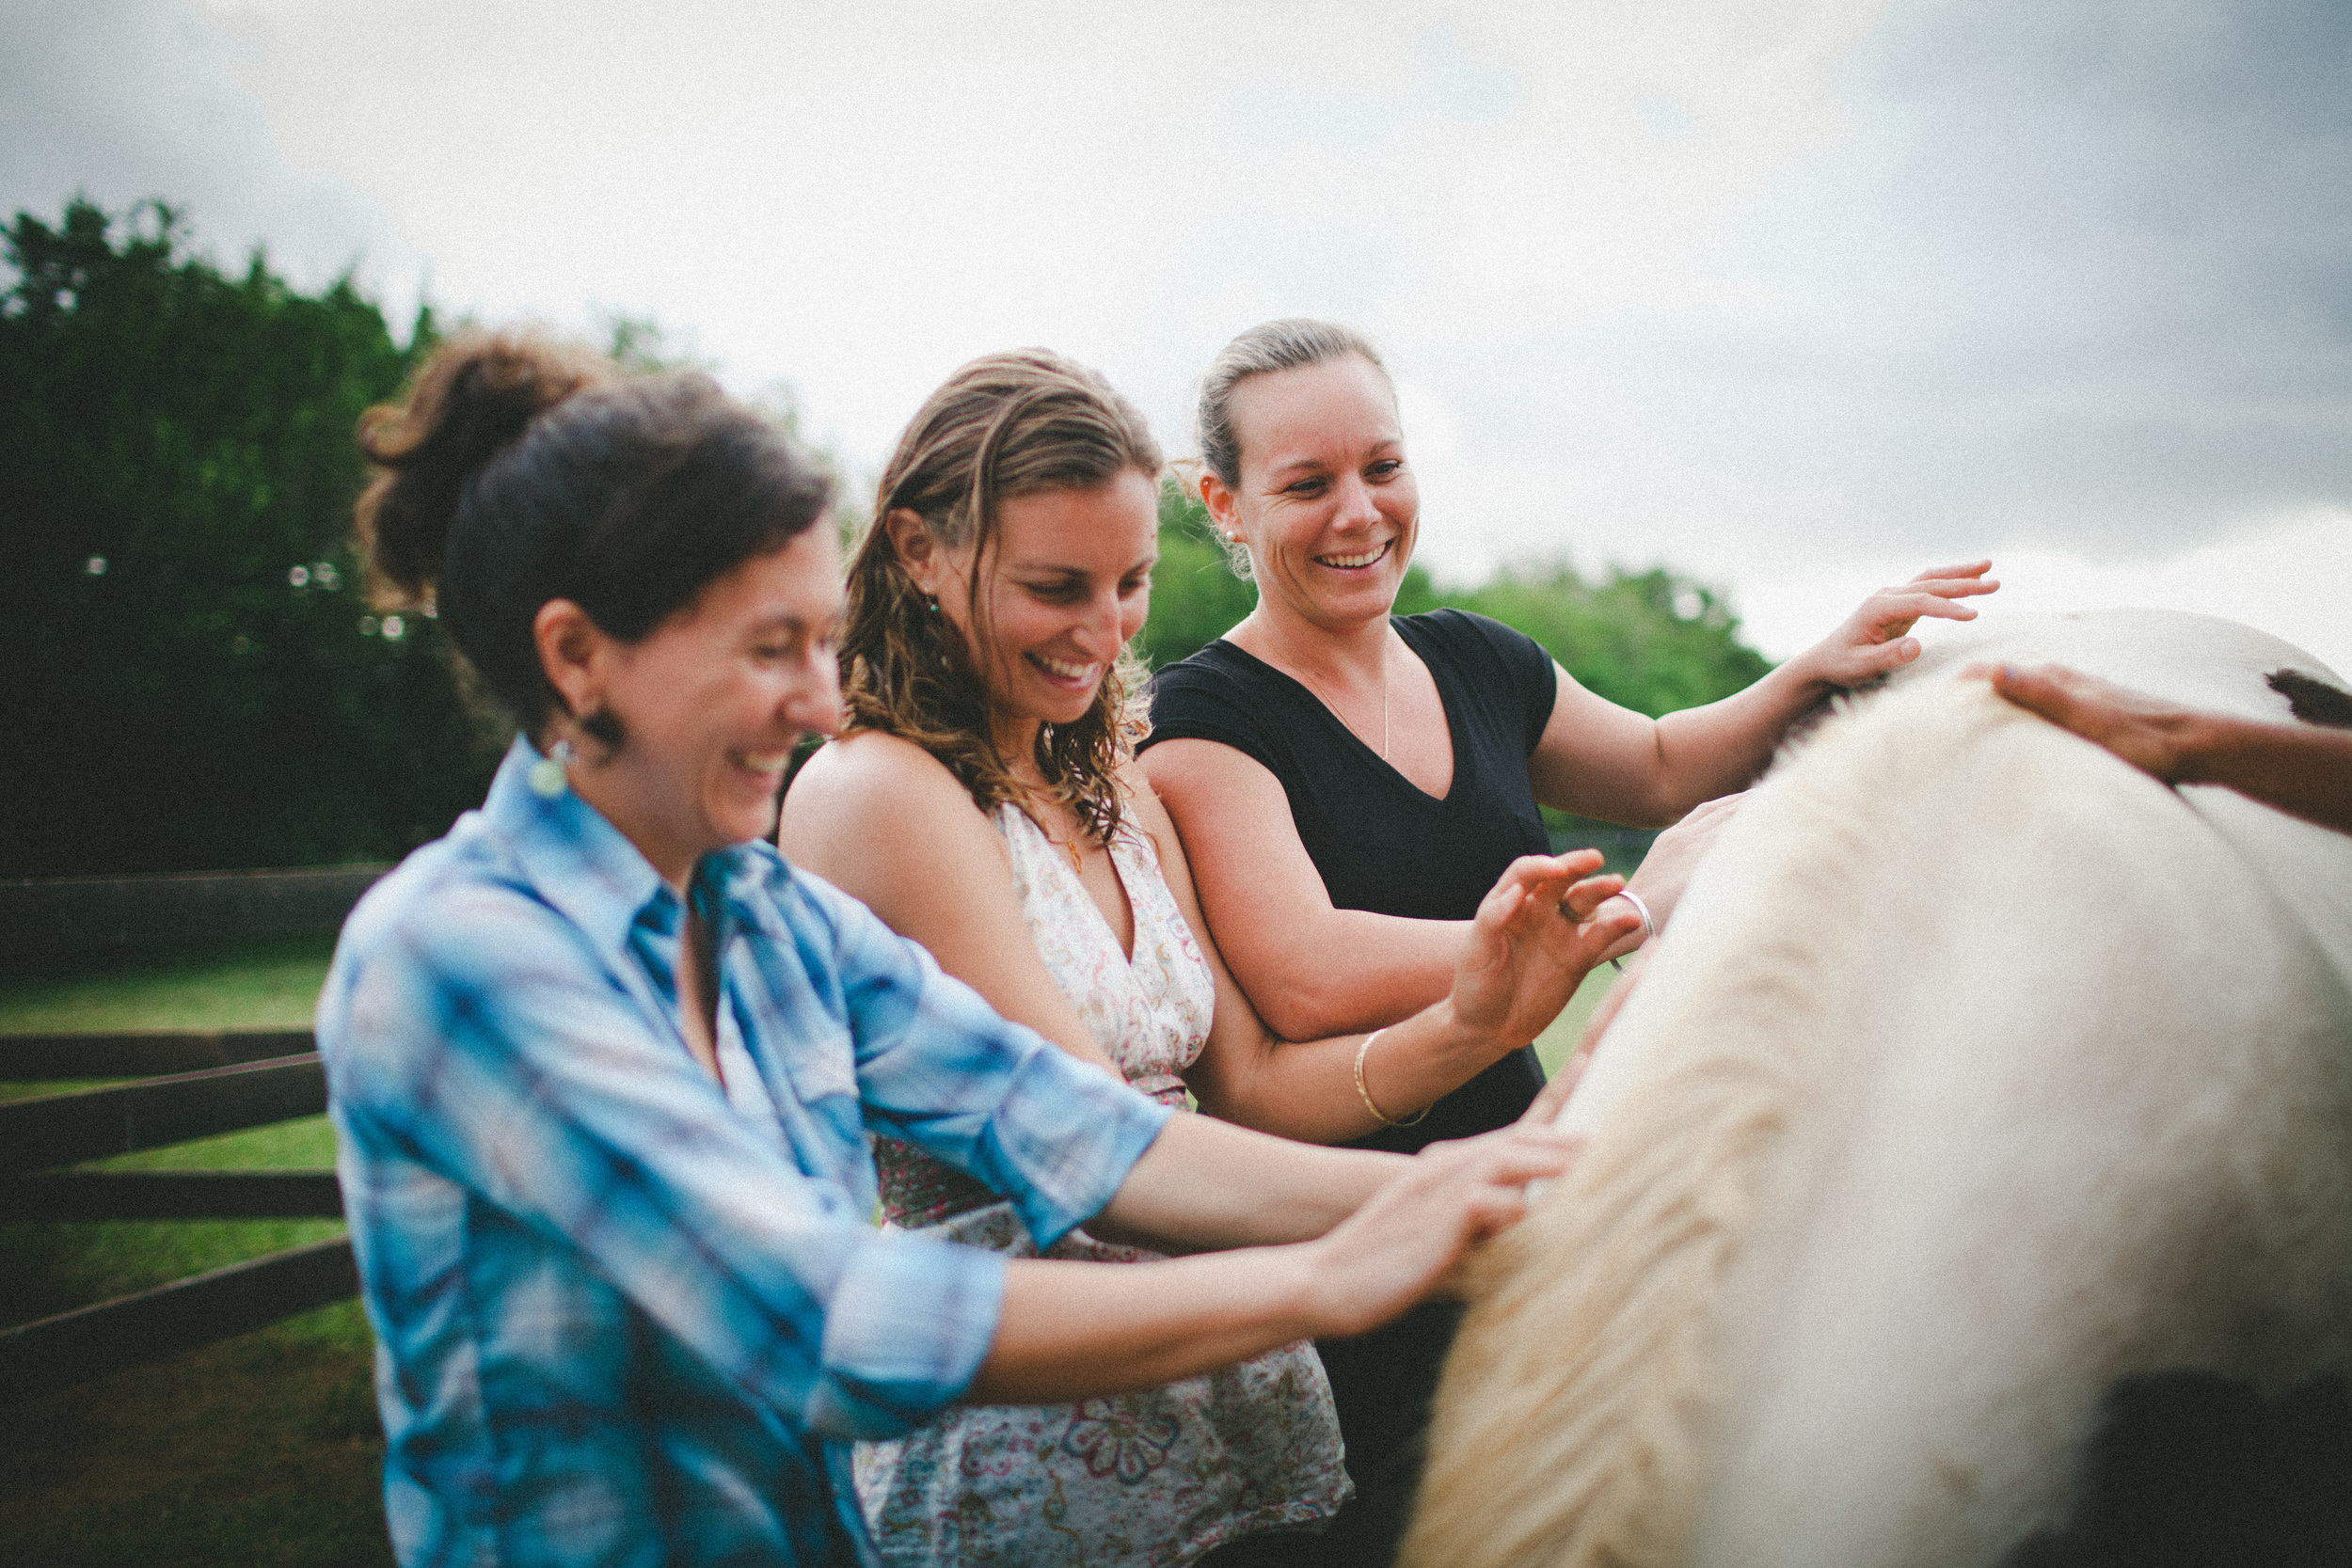 tarah-horse-cadencia-photography-5125.jpg